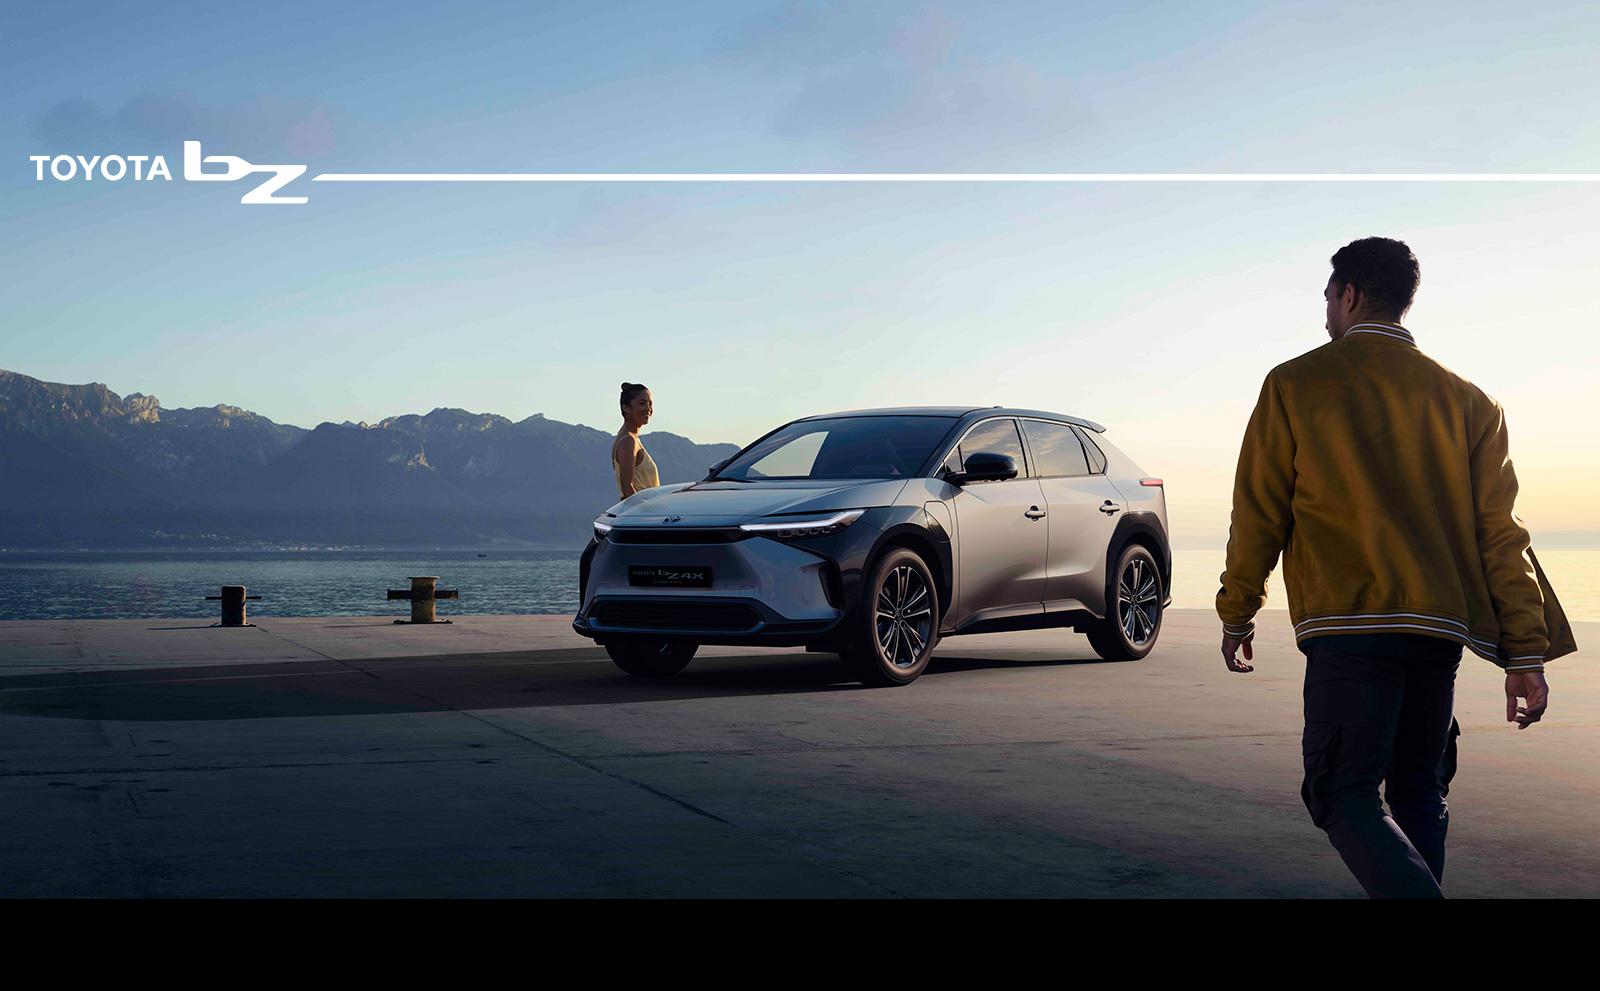 Bild Neue Toyota Produktfamilie: Toyota bZ